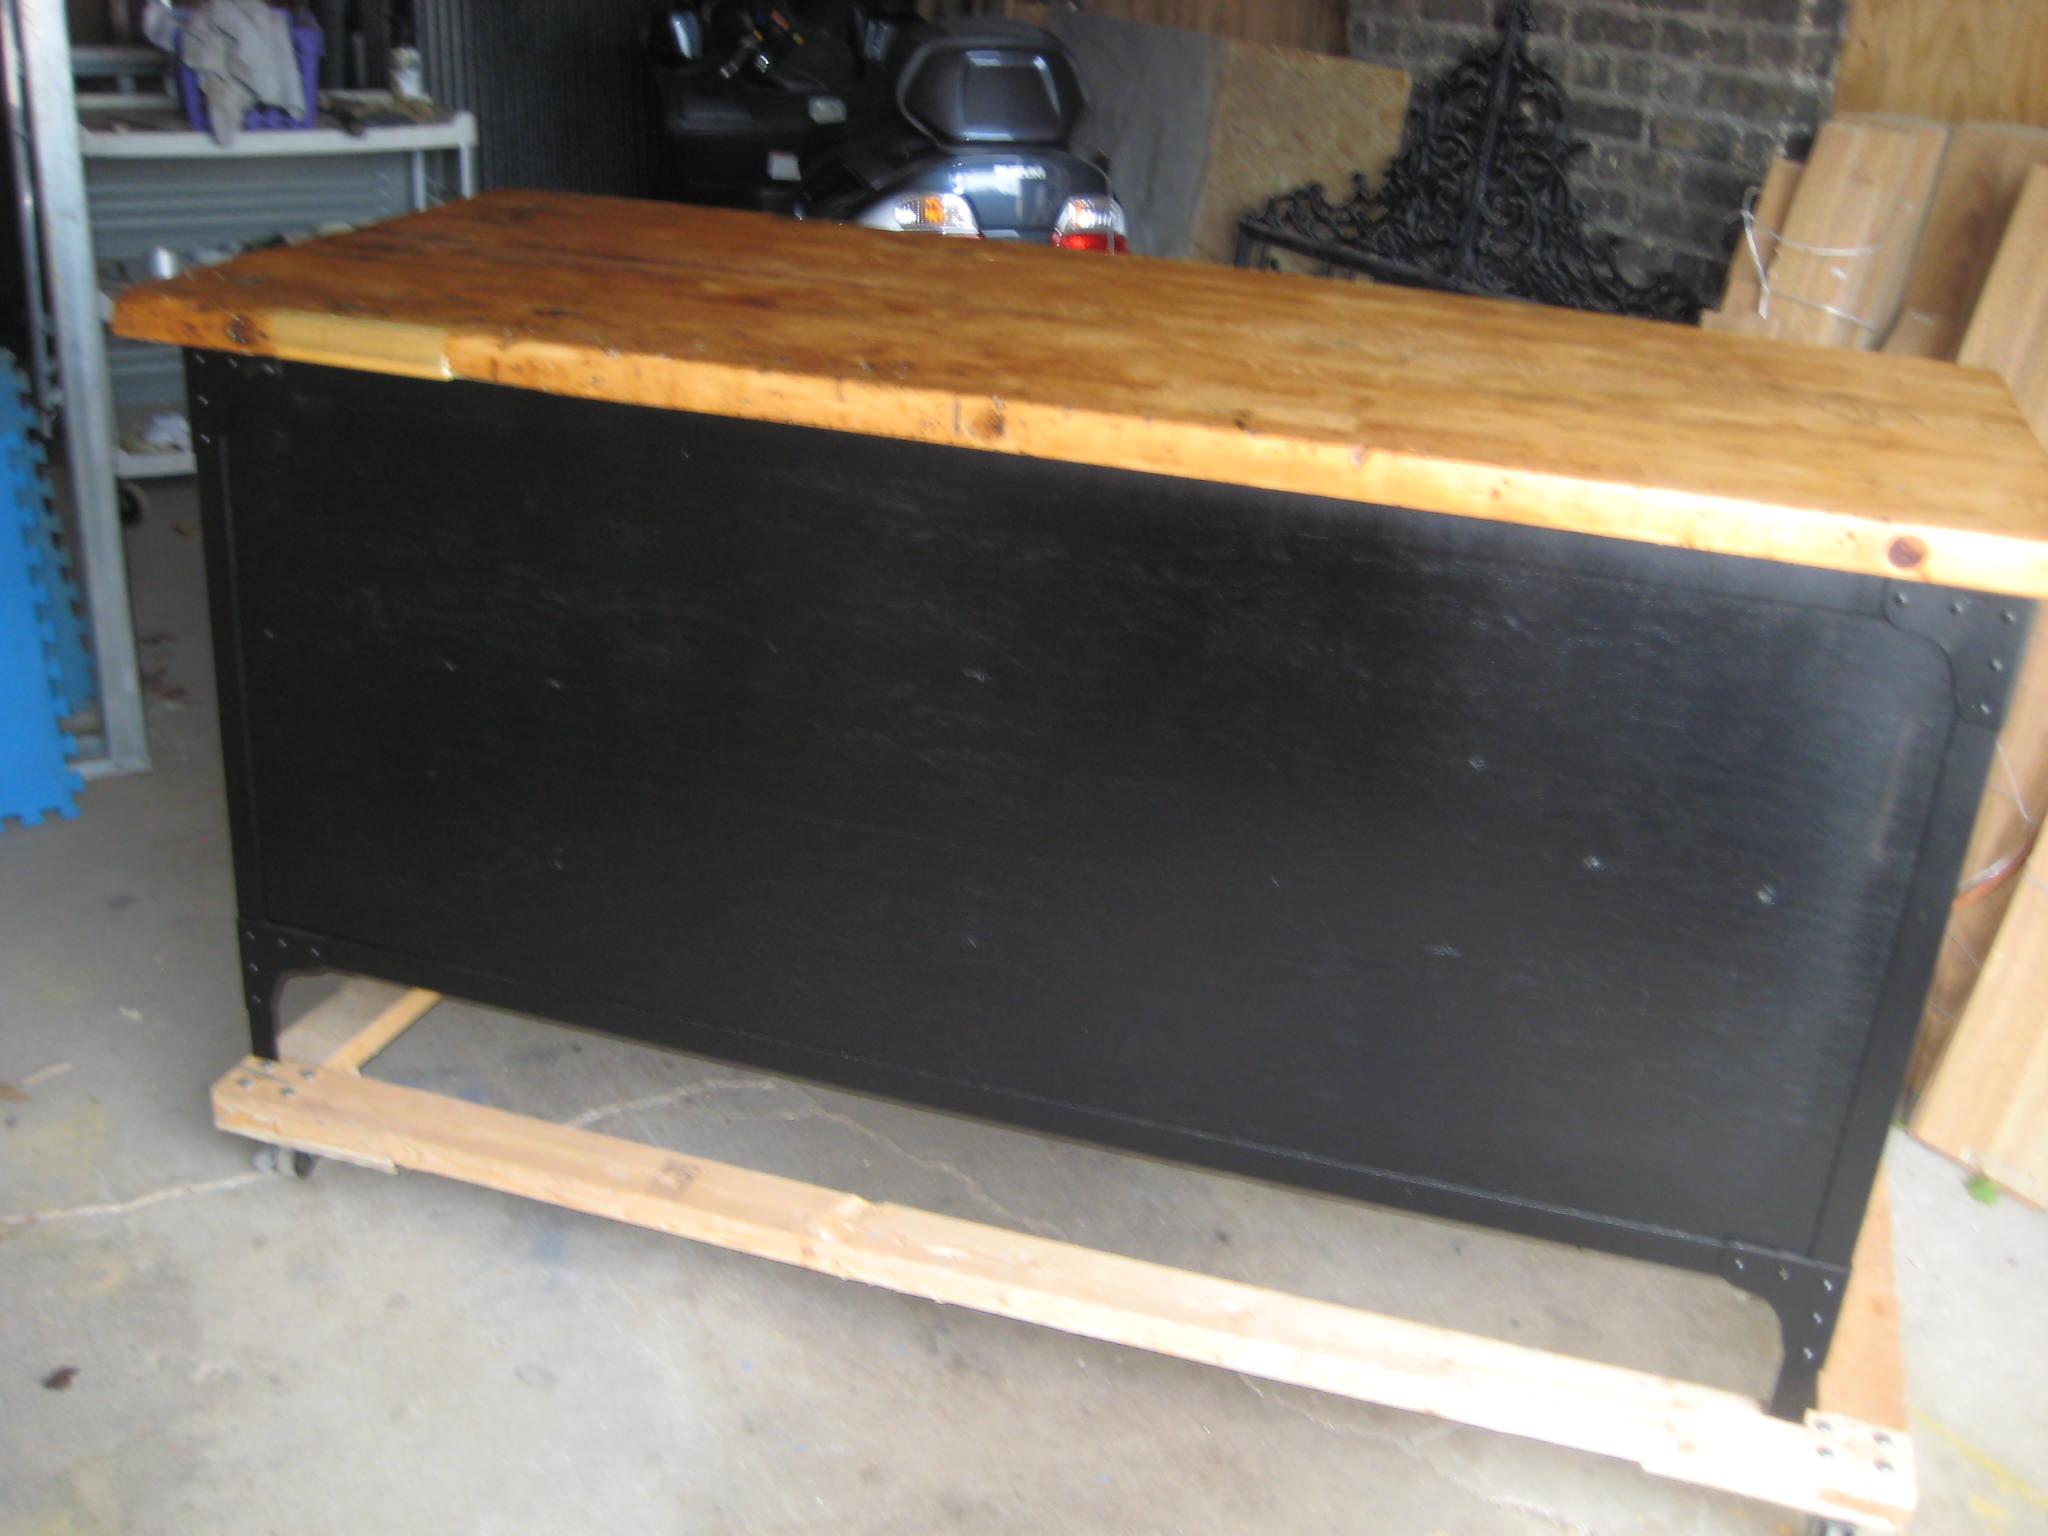 Groovy Vintage Industrial Work Bench For Sale Antiques Com Frankydiablos Diy Chair Ideas Frankydiabloscom